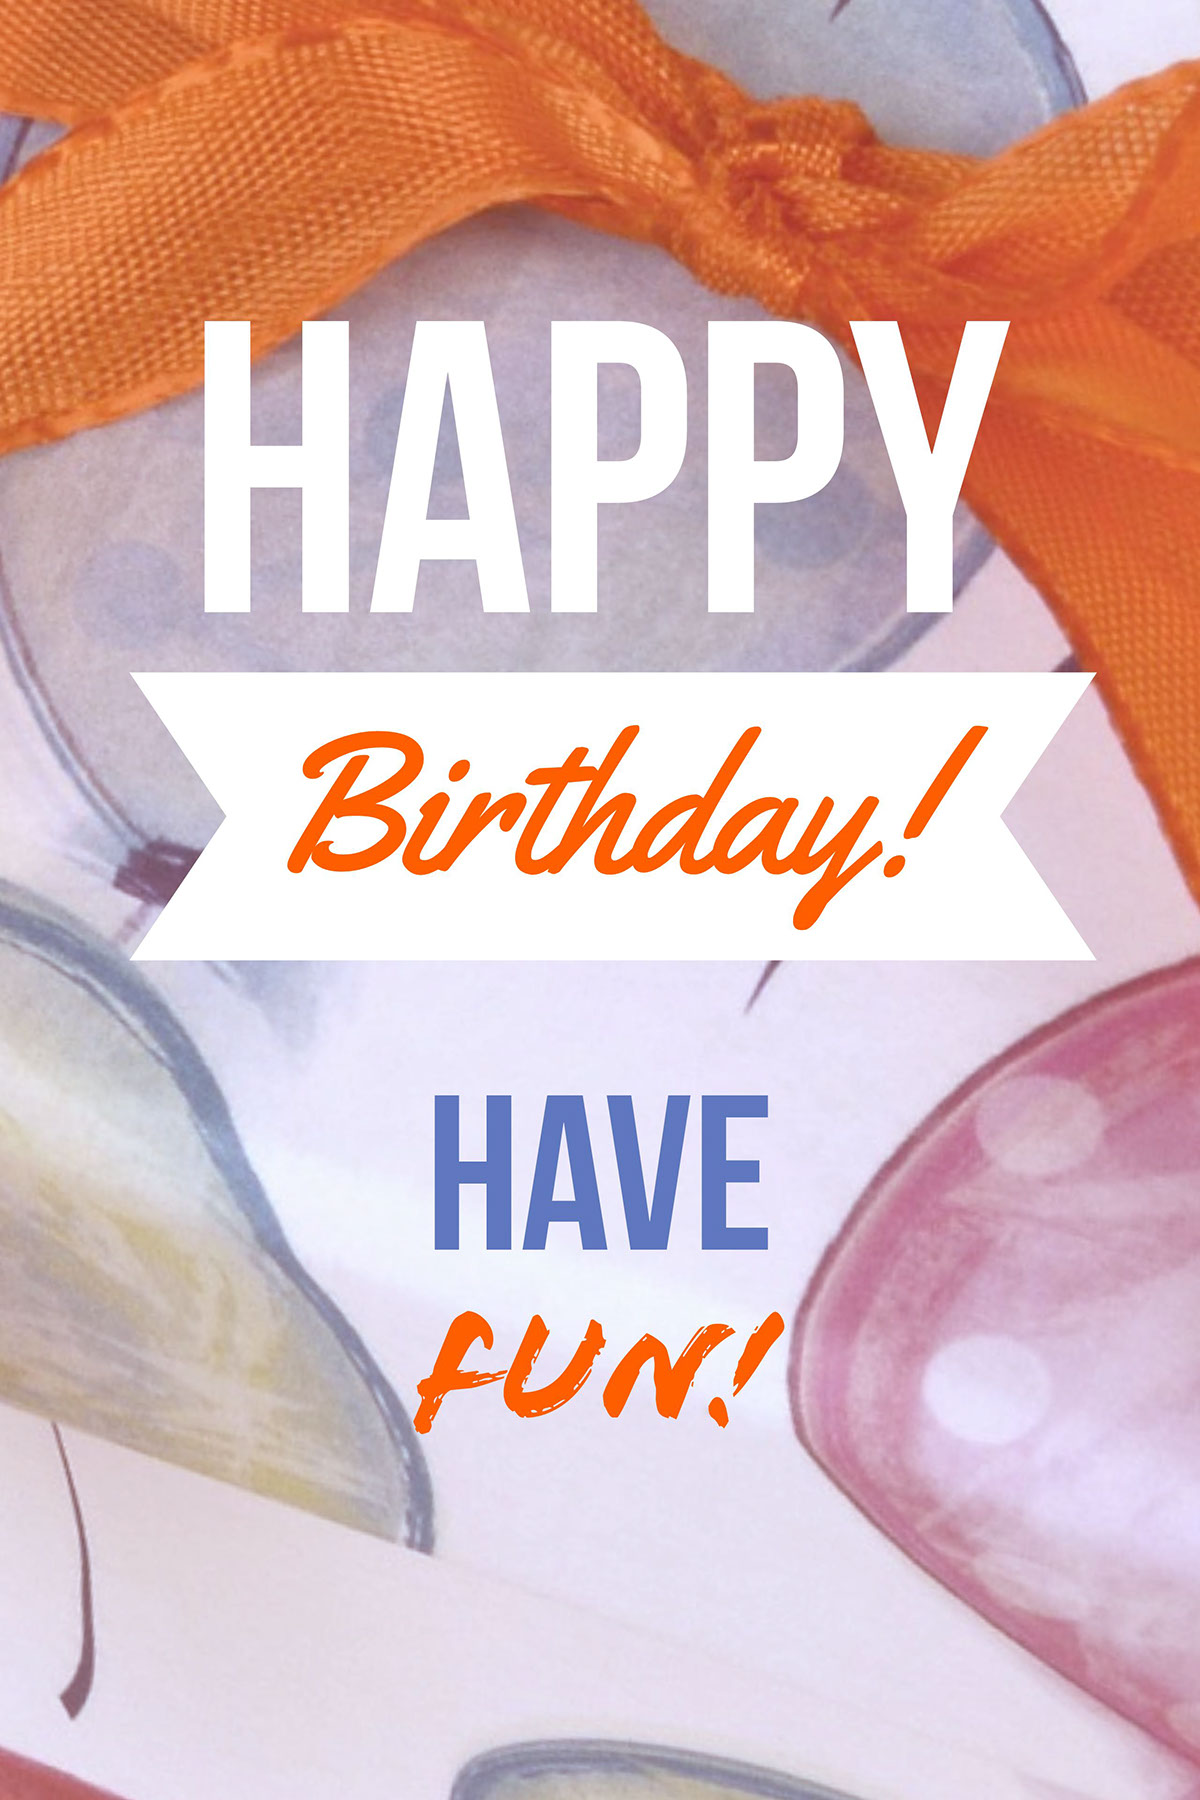 Happy Happy Birthday! Have Fun!